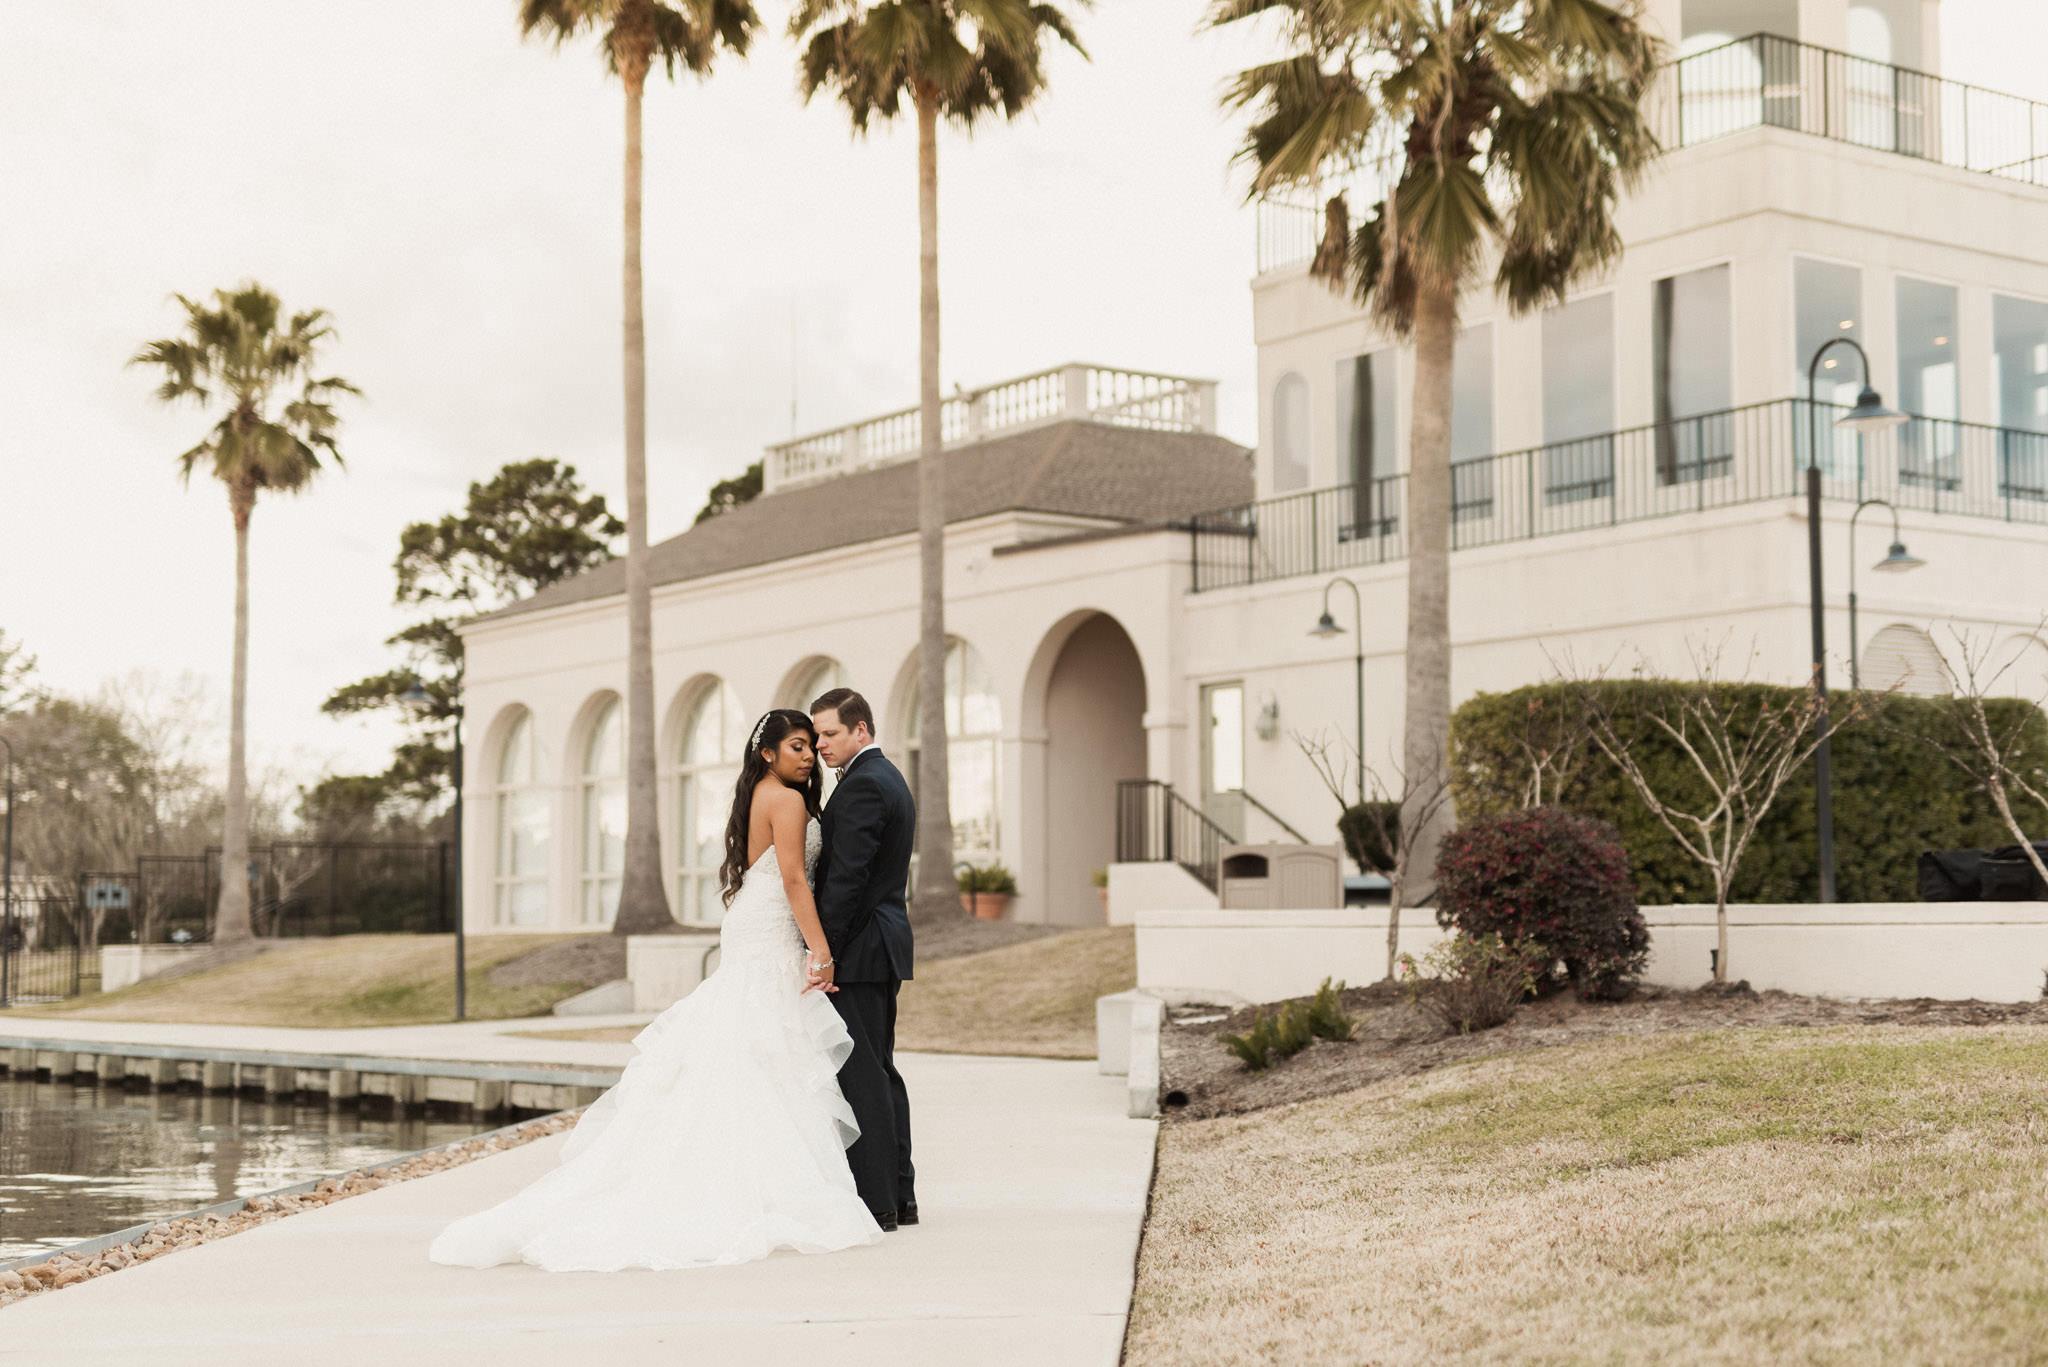 maria-william-montgomery-tx-wedding-bentwater-country-club-sm5.jpg